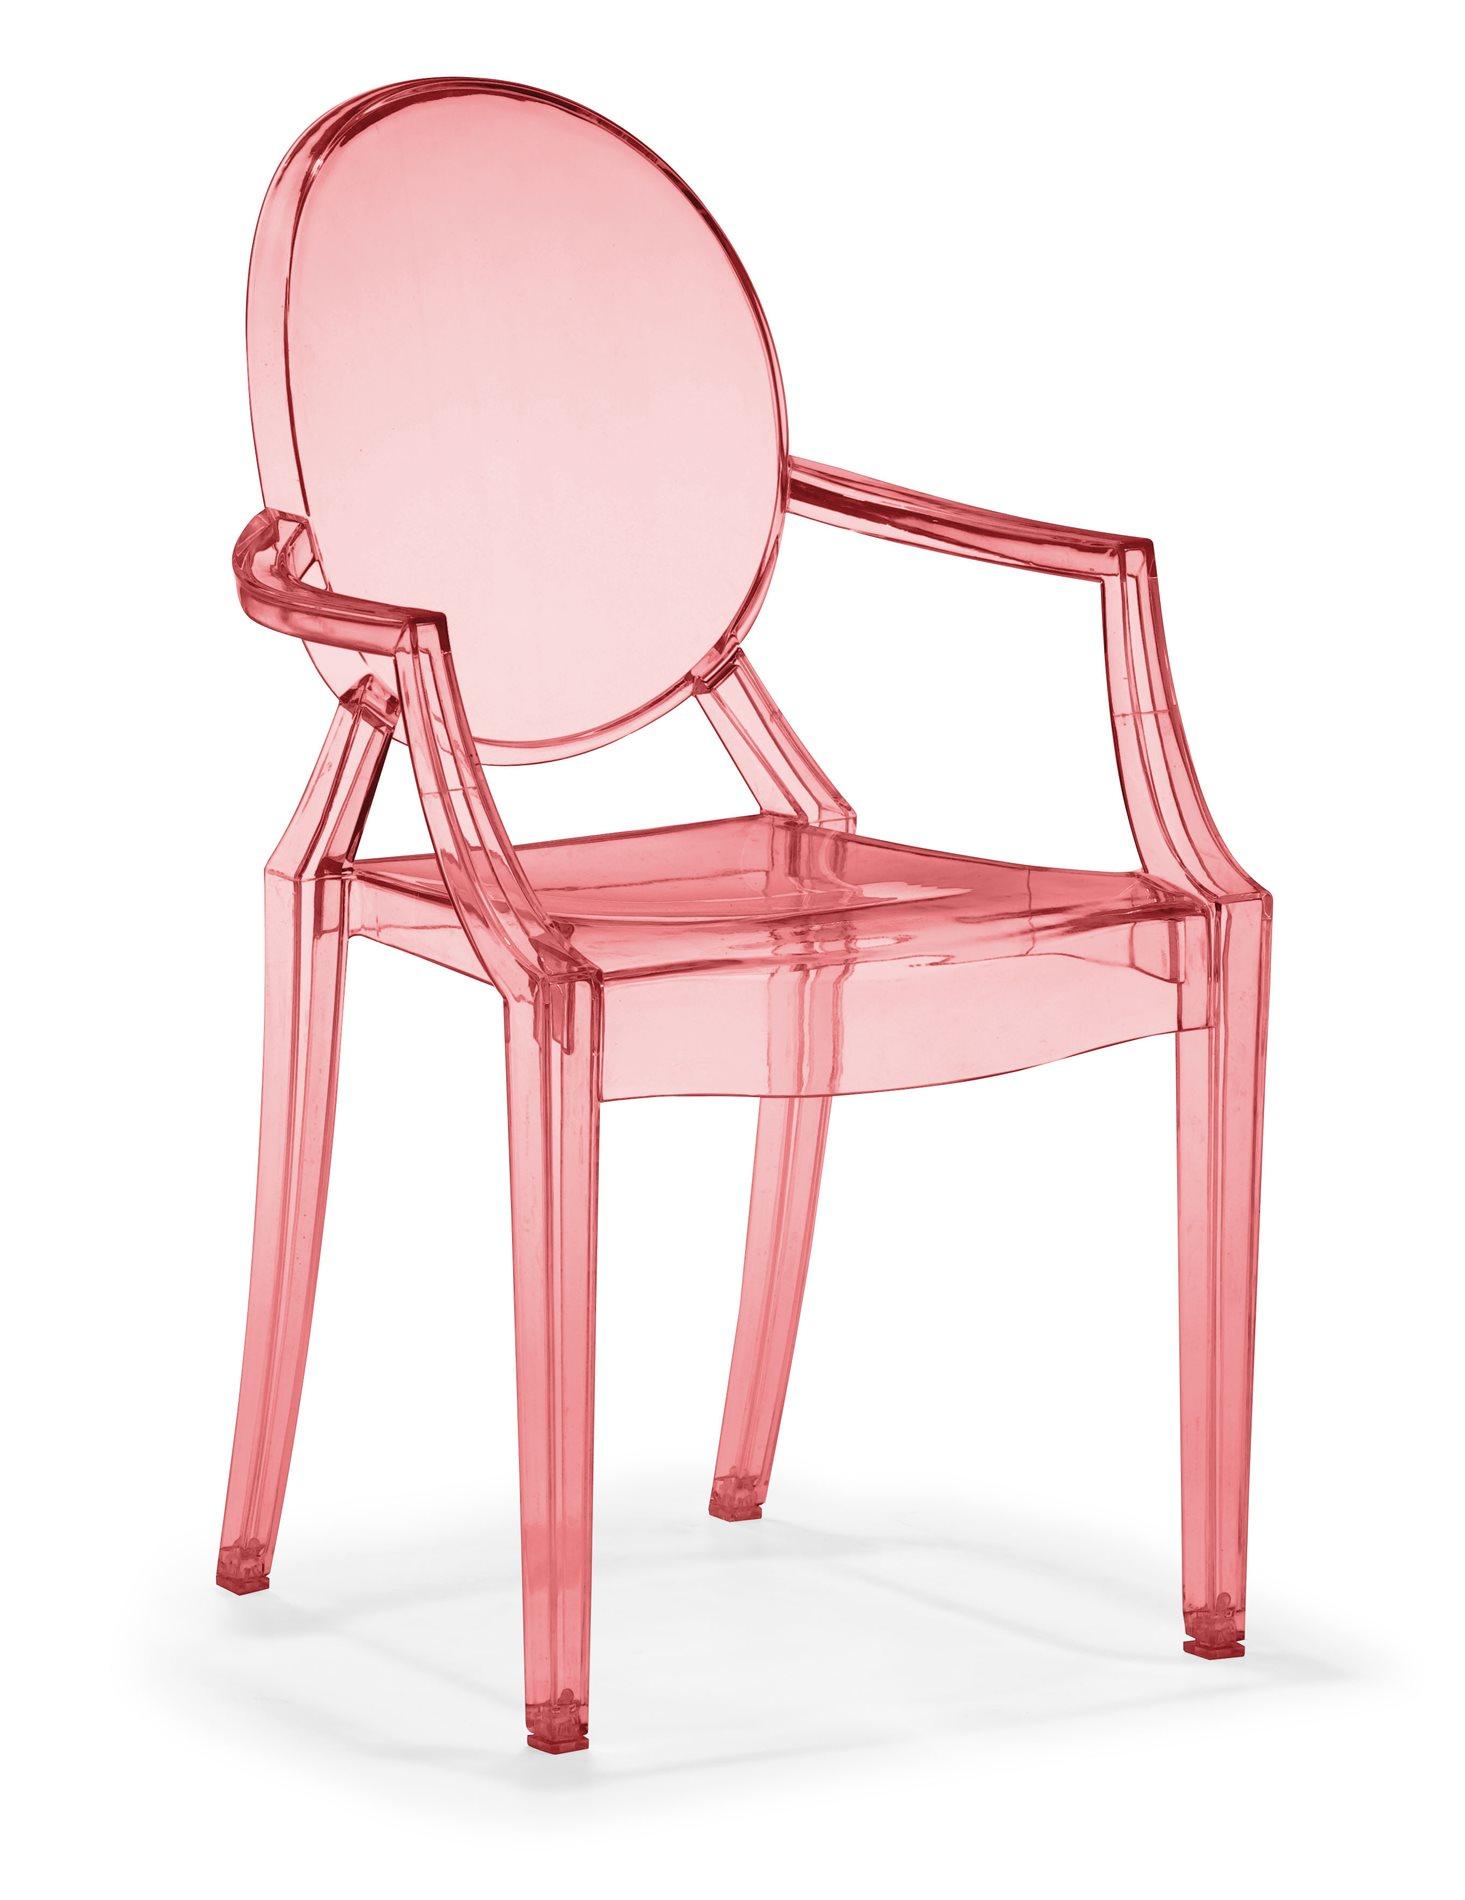 baby lawn chair ergonomic in chennai zuo modern 105183 anime kids pack of 2